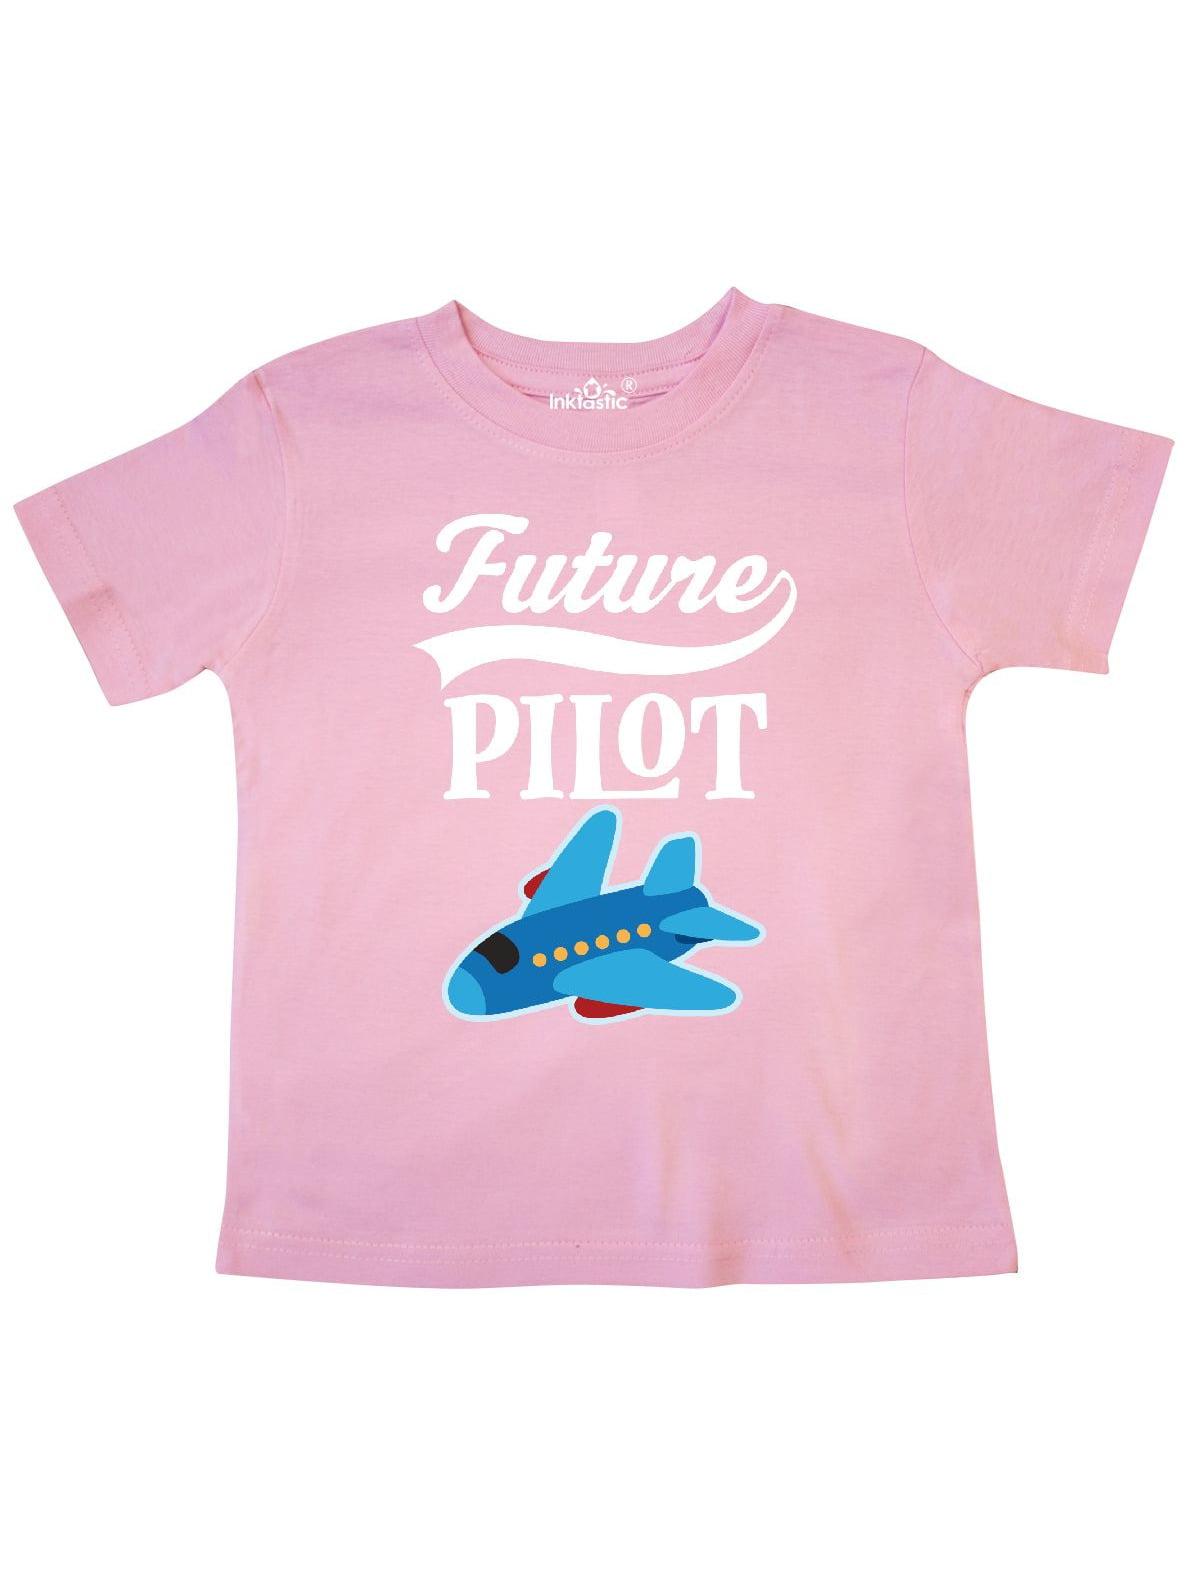 Inktastic Girls Pink Airplane Pilot Infant Dress Plane Future Flying Clothing